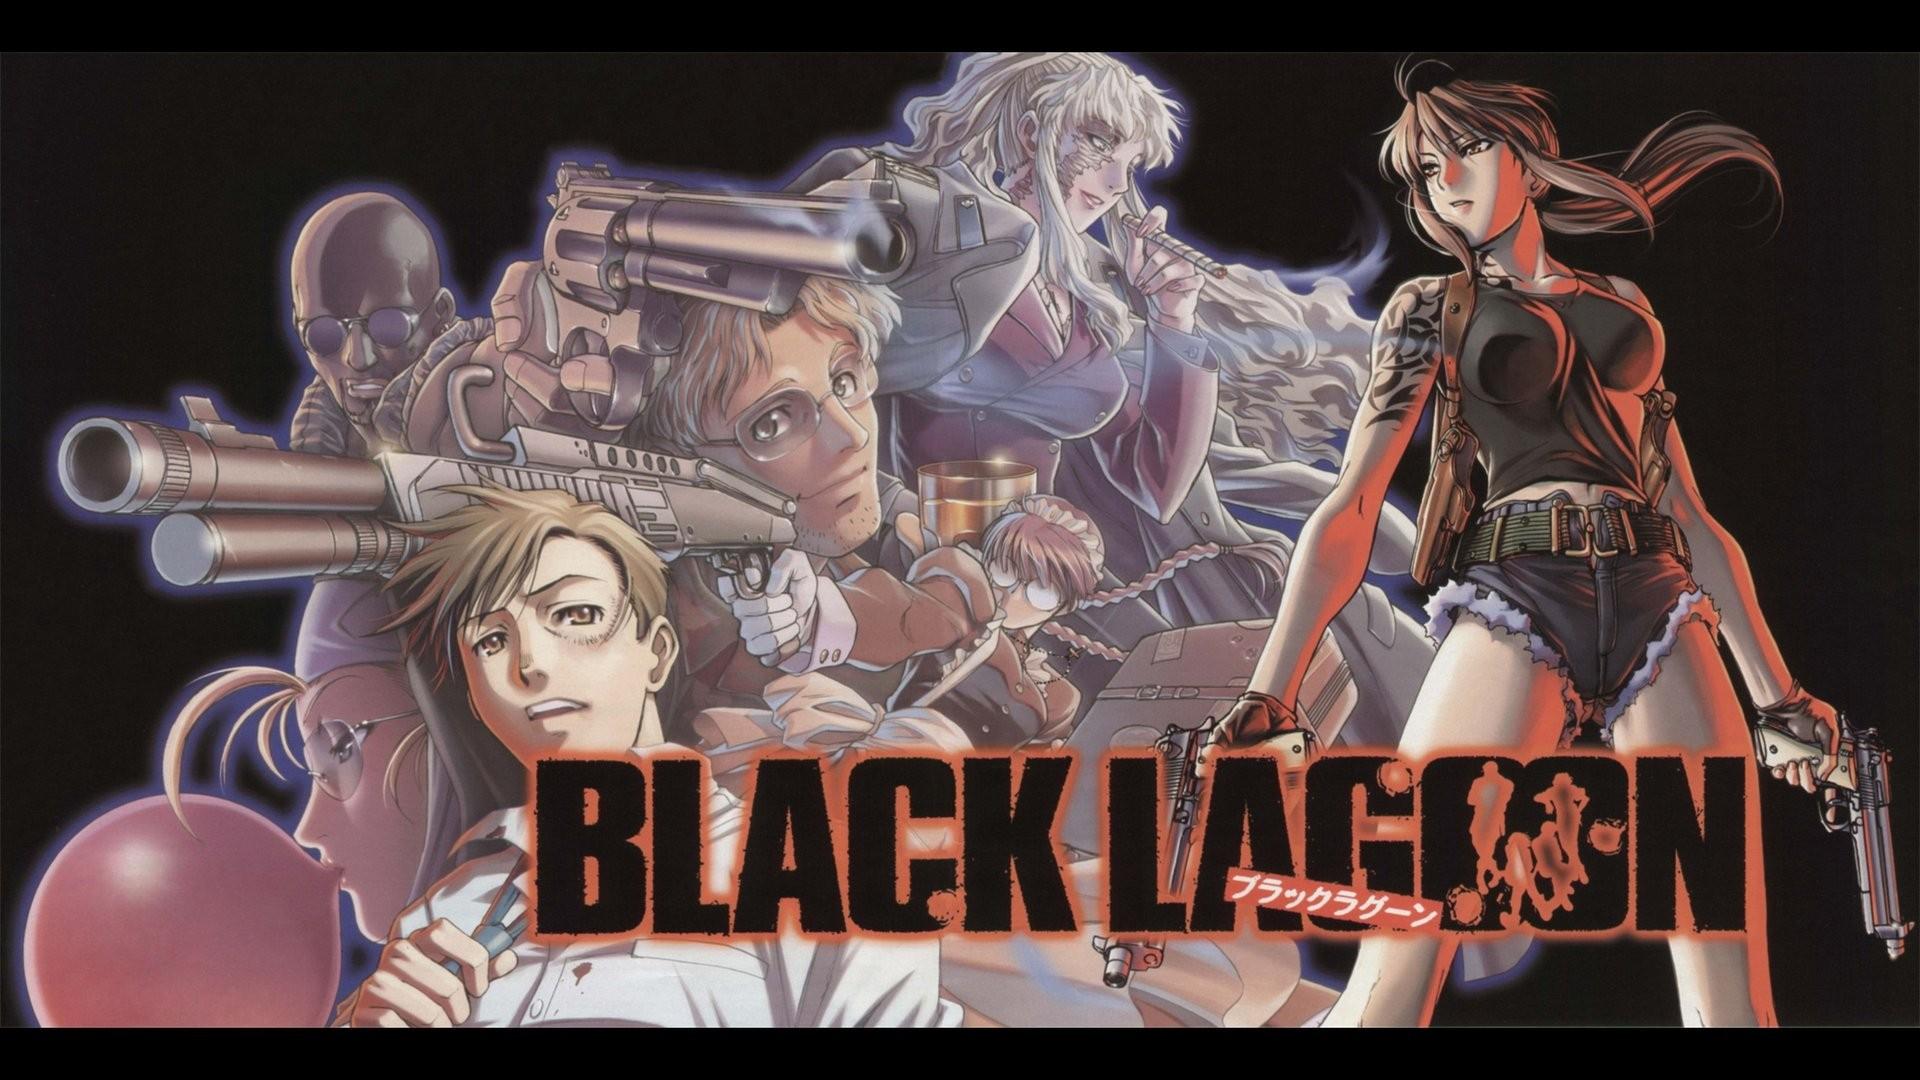 Black Lagoon wallpaper ·① Download free amazing High ...